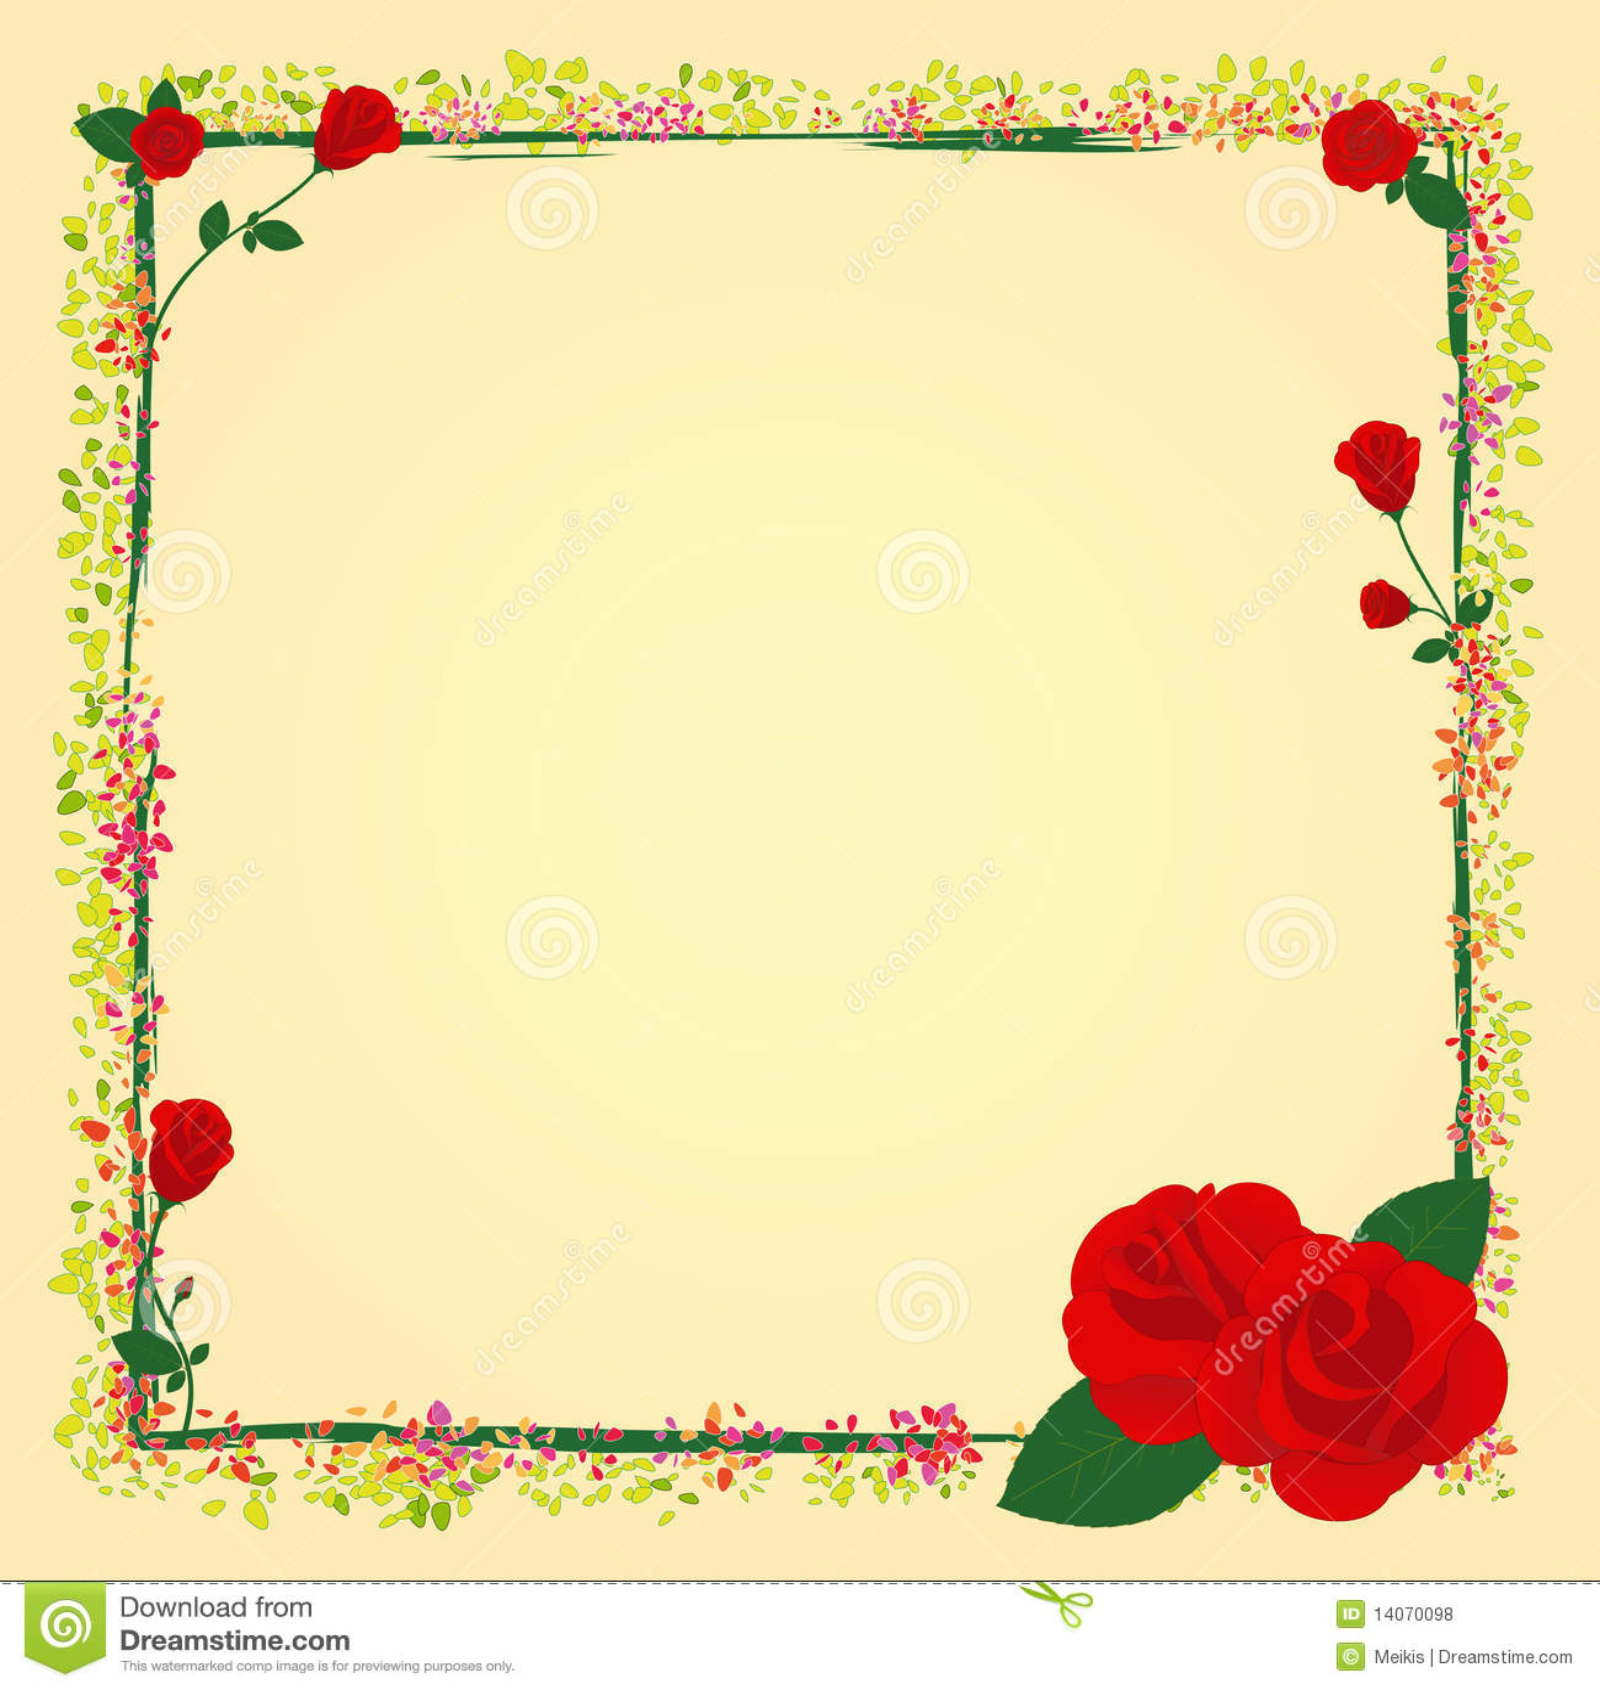 Rose Flower Garden Hd Wallpaper Summer Rose Garden Flower Frame Royalty Free Stock Photos